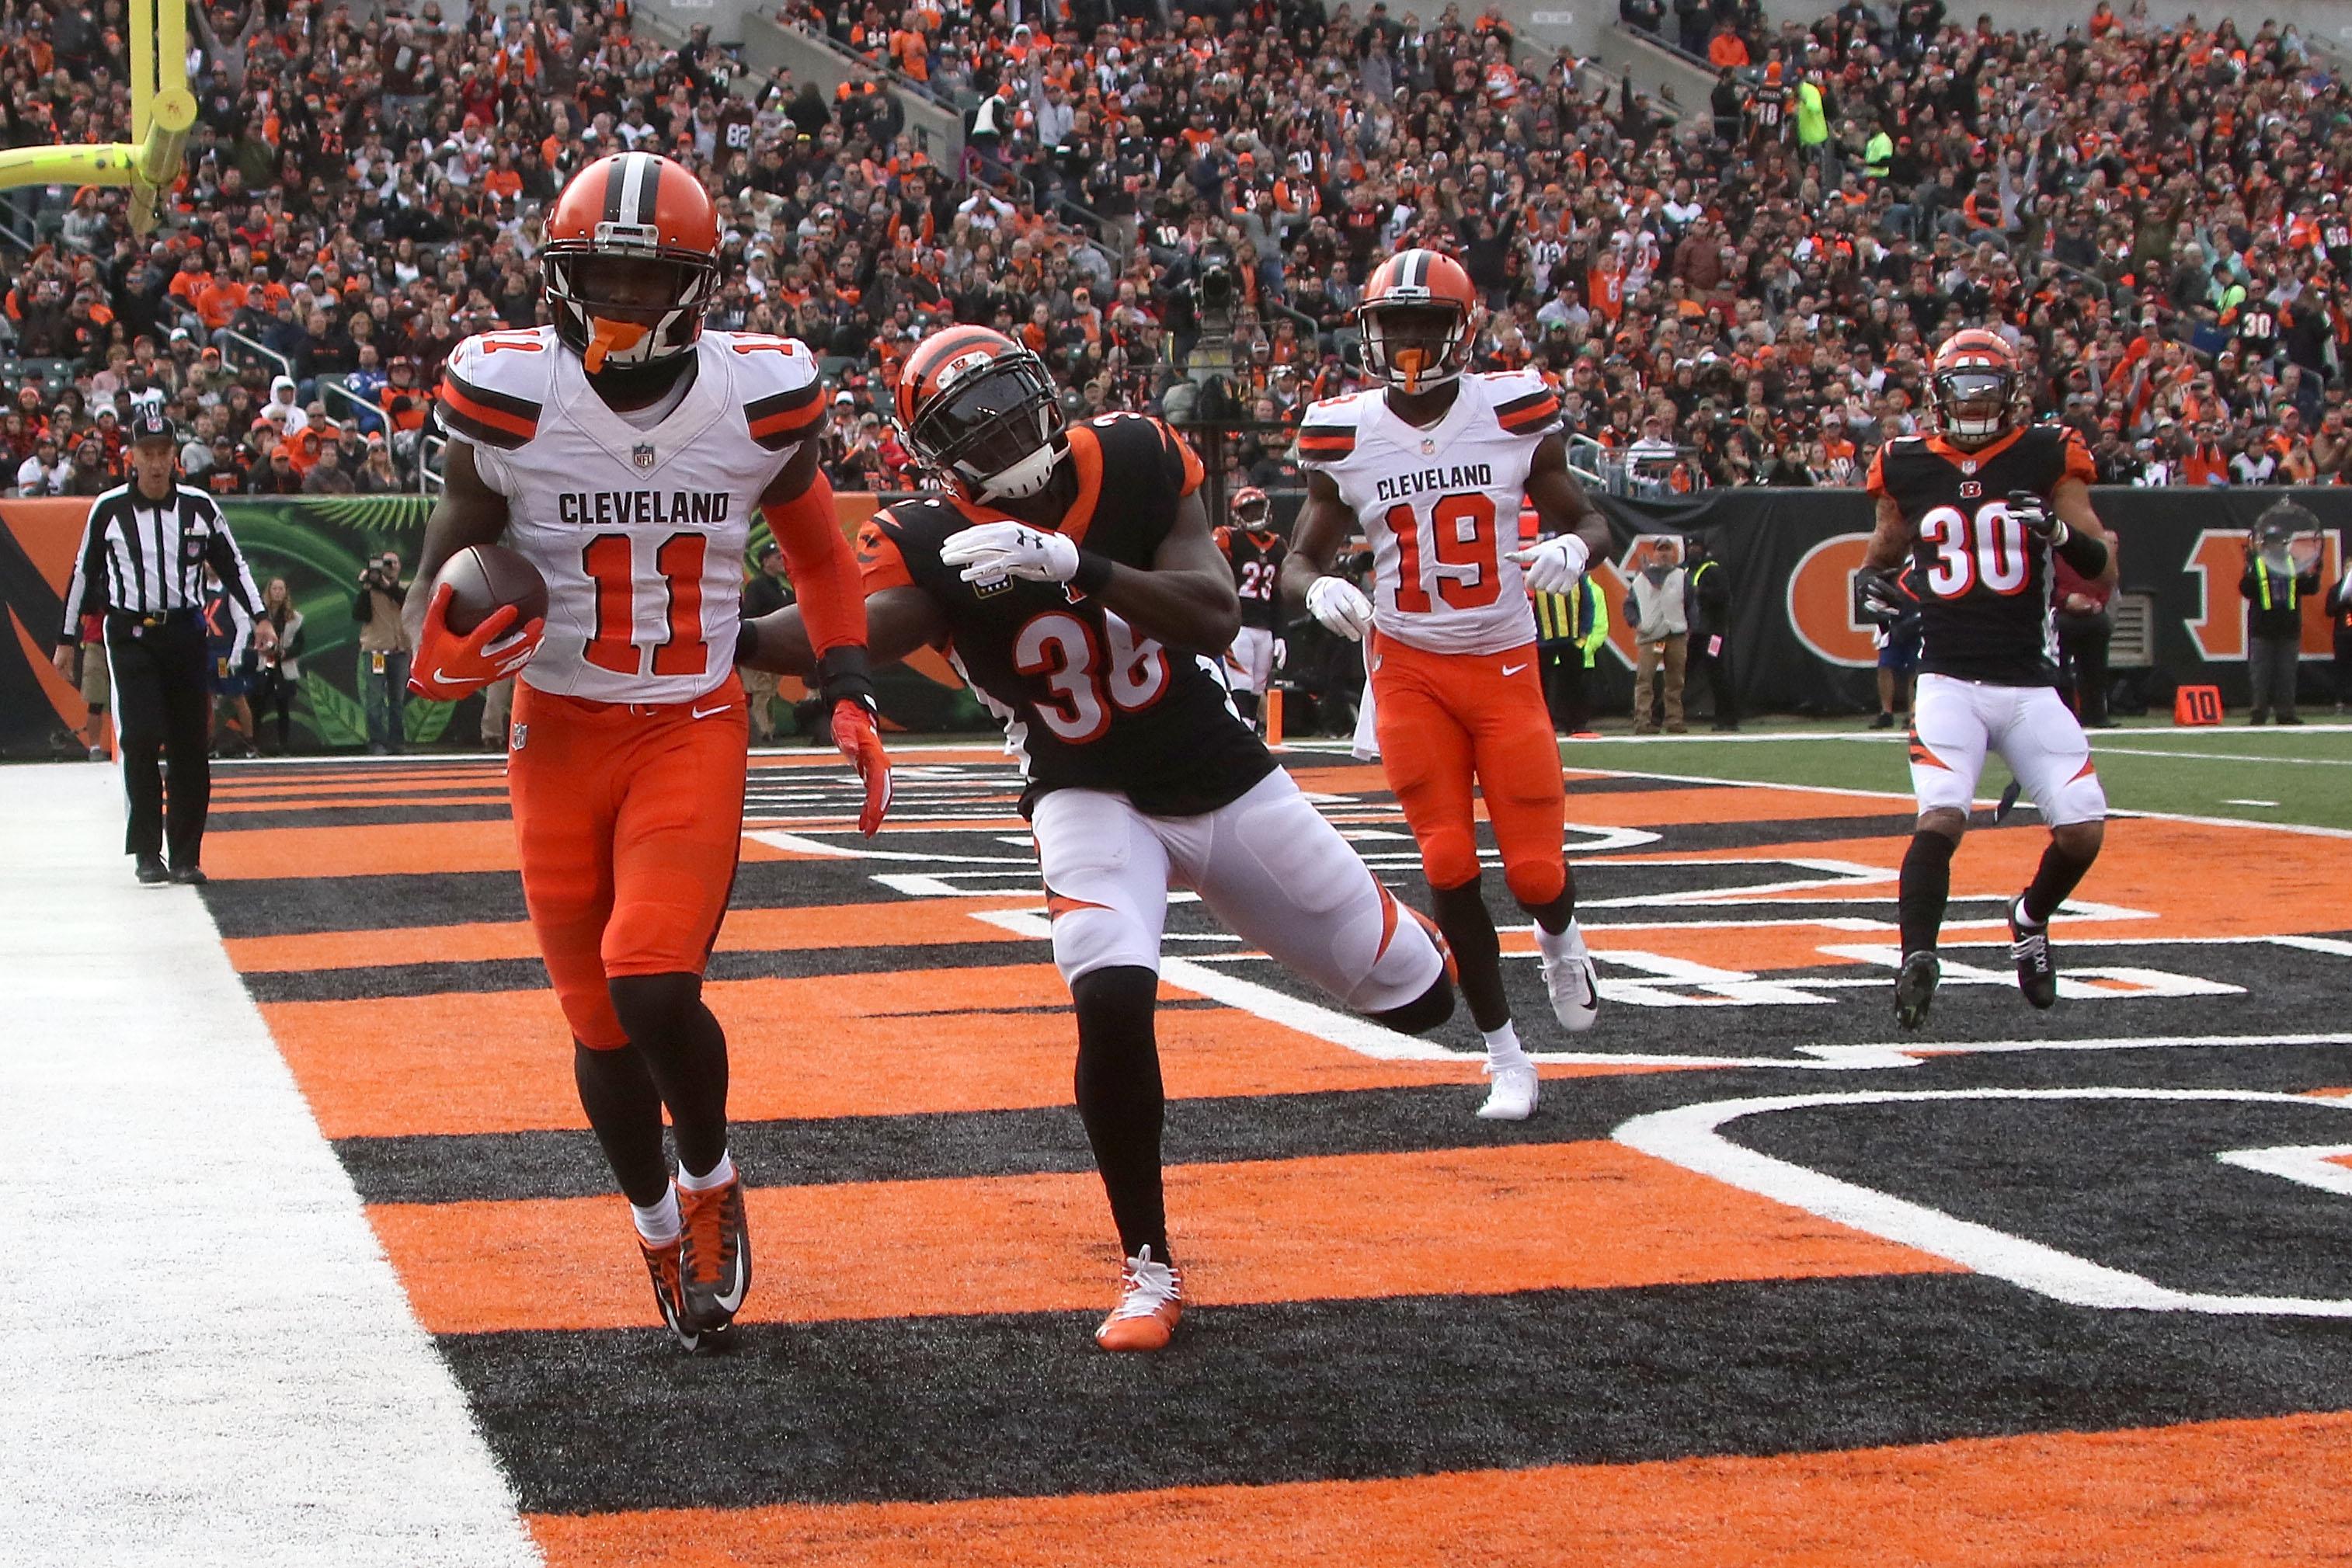 Cleveland Browns WR Antonio Callaway scores a touchdown past Cincinnati Bengals S Shawn Williams in Week 12, Nov. 25, 2018.